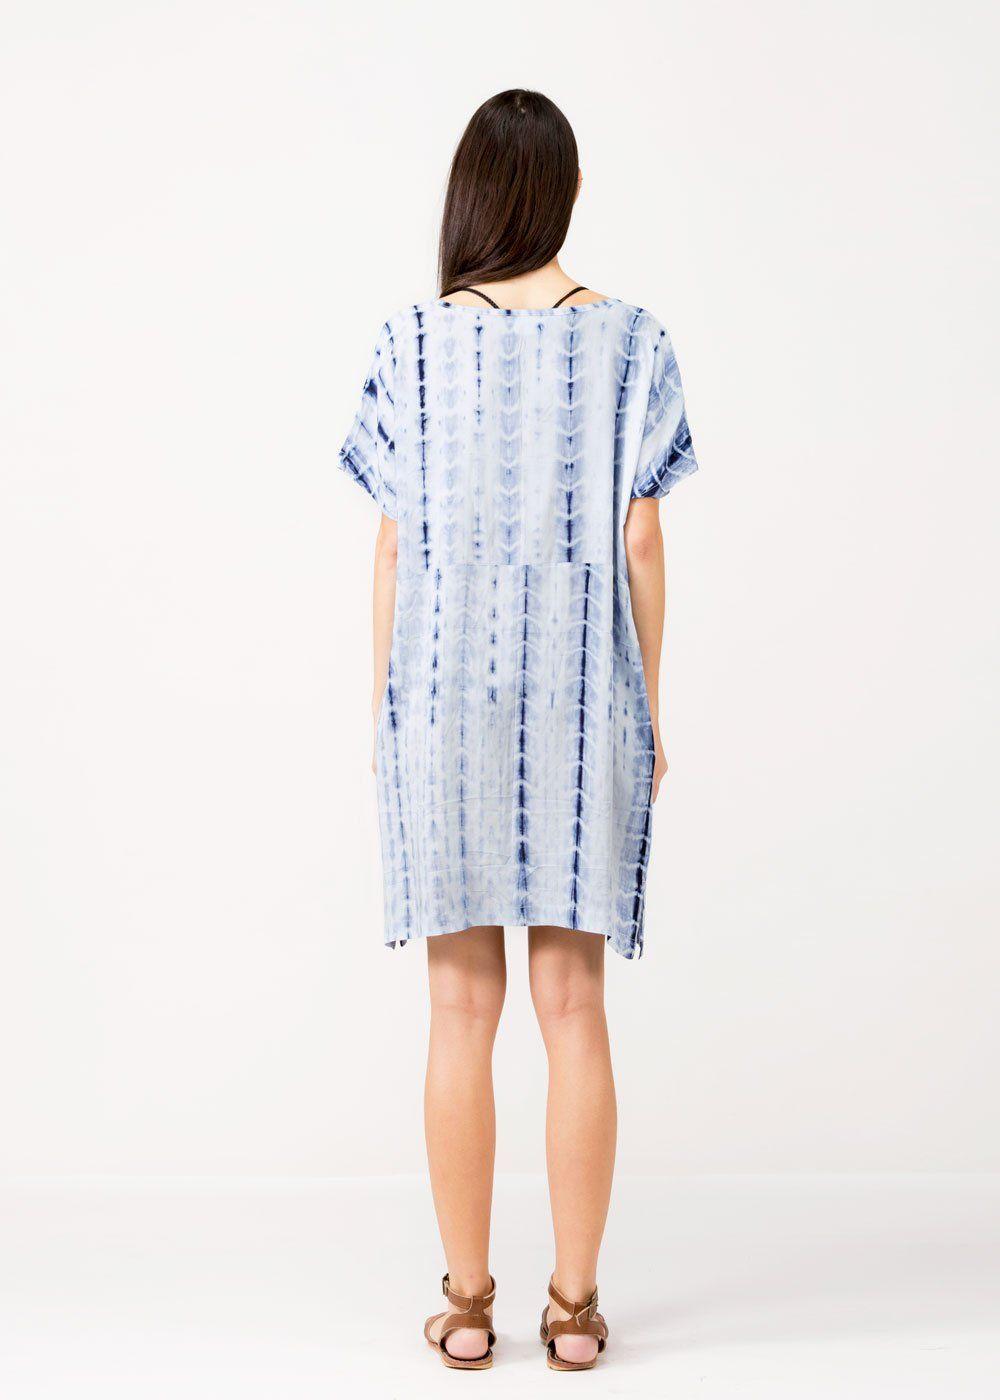 a2bef018aeef Stripe Tie Dye Dress – Look By M